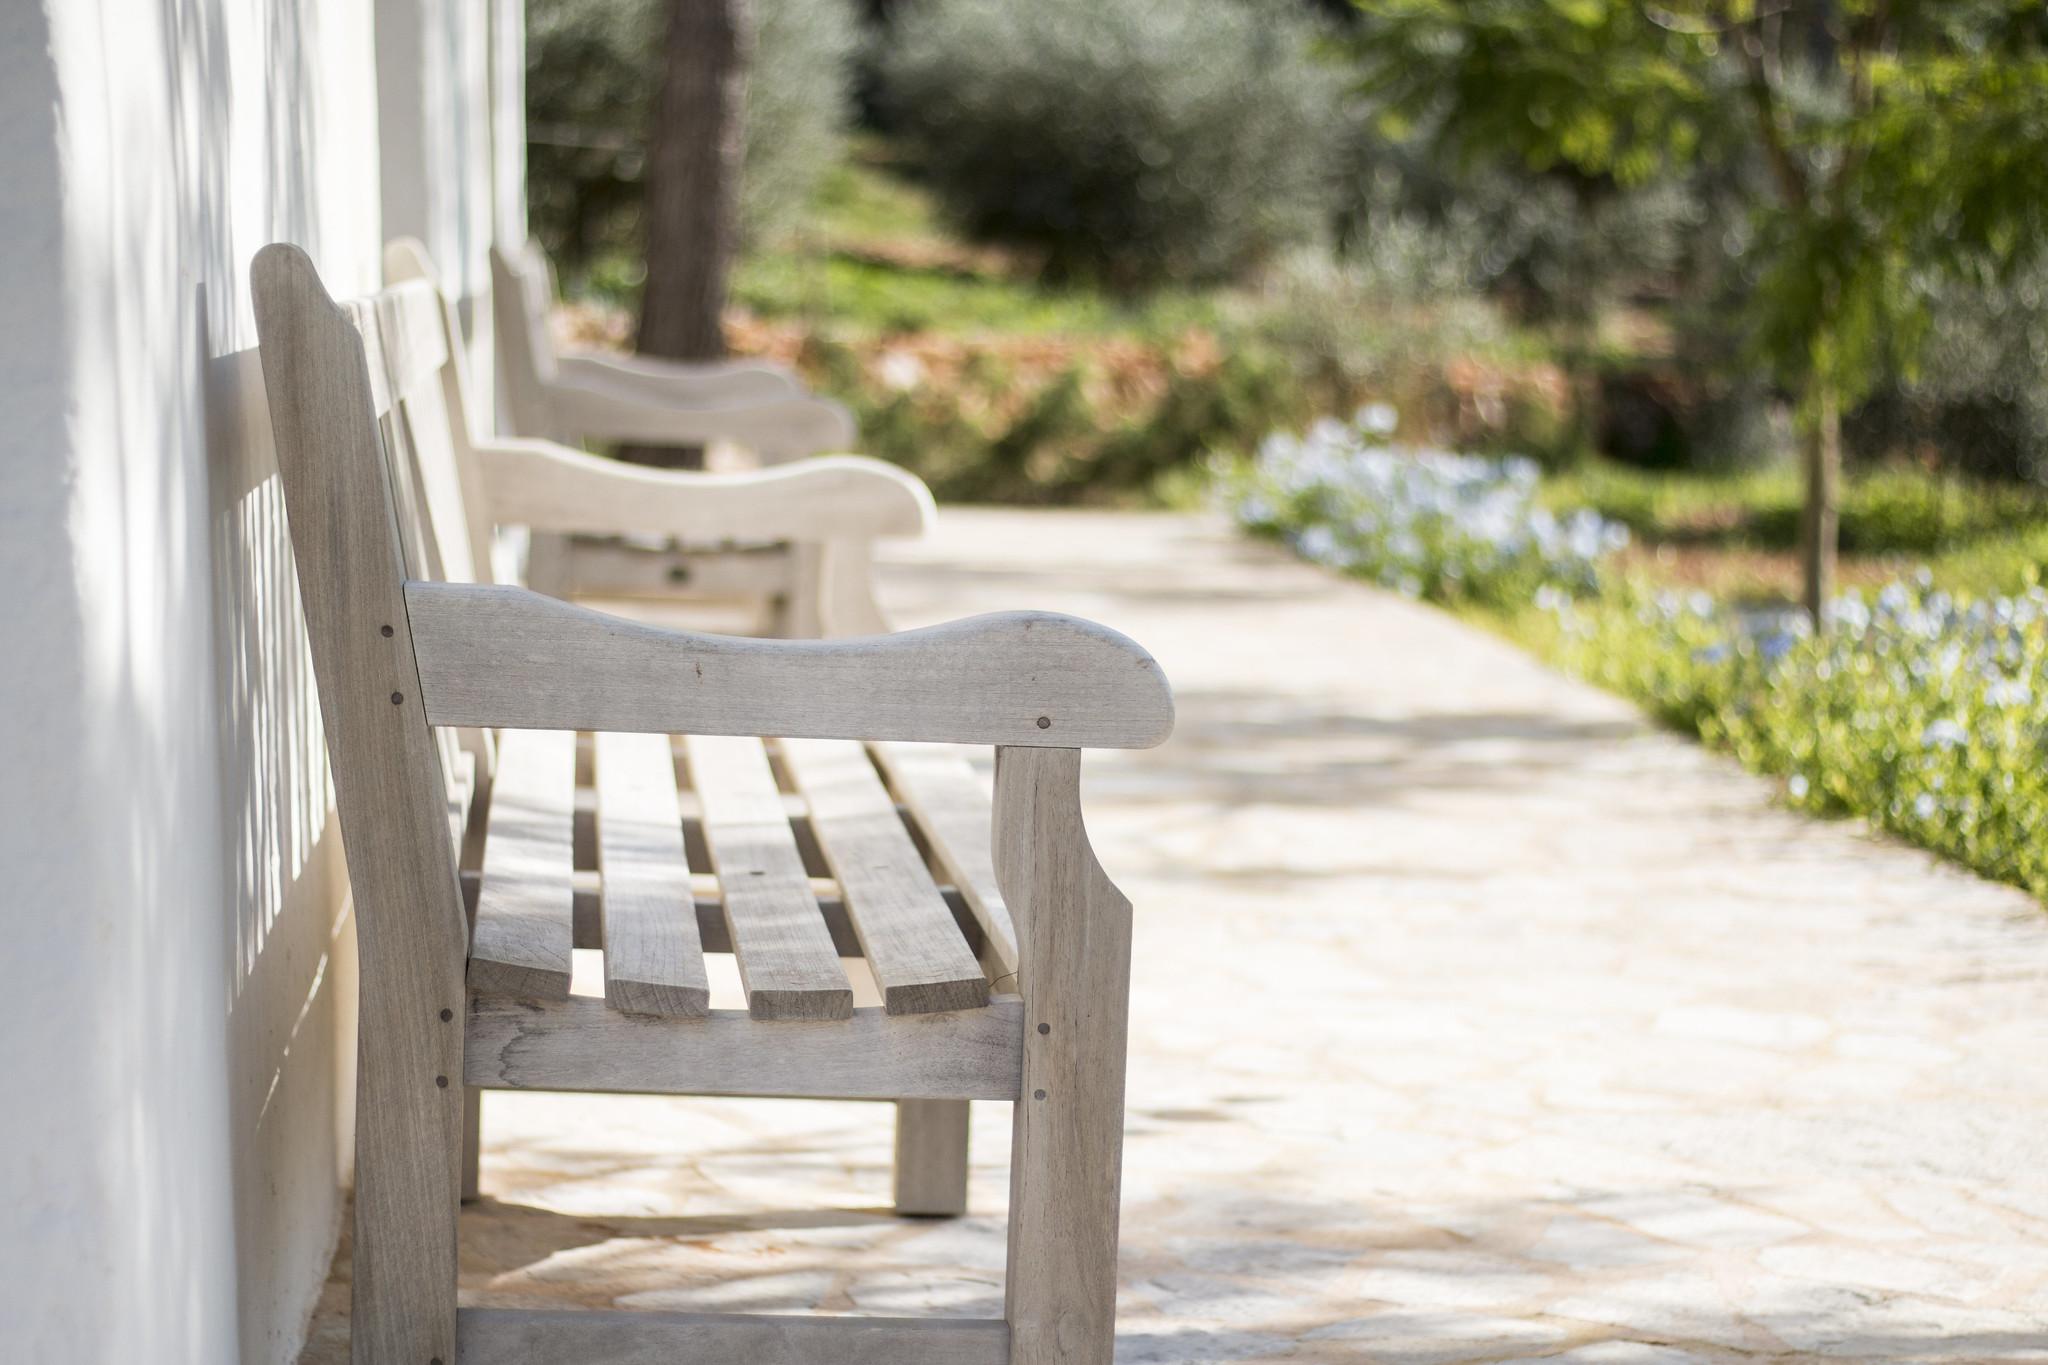 https://www.white-ibiza.com/wp-content/uploads/2020/05/white-ibiza-villas-can-terra-bench.jpg